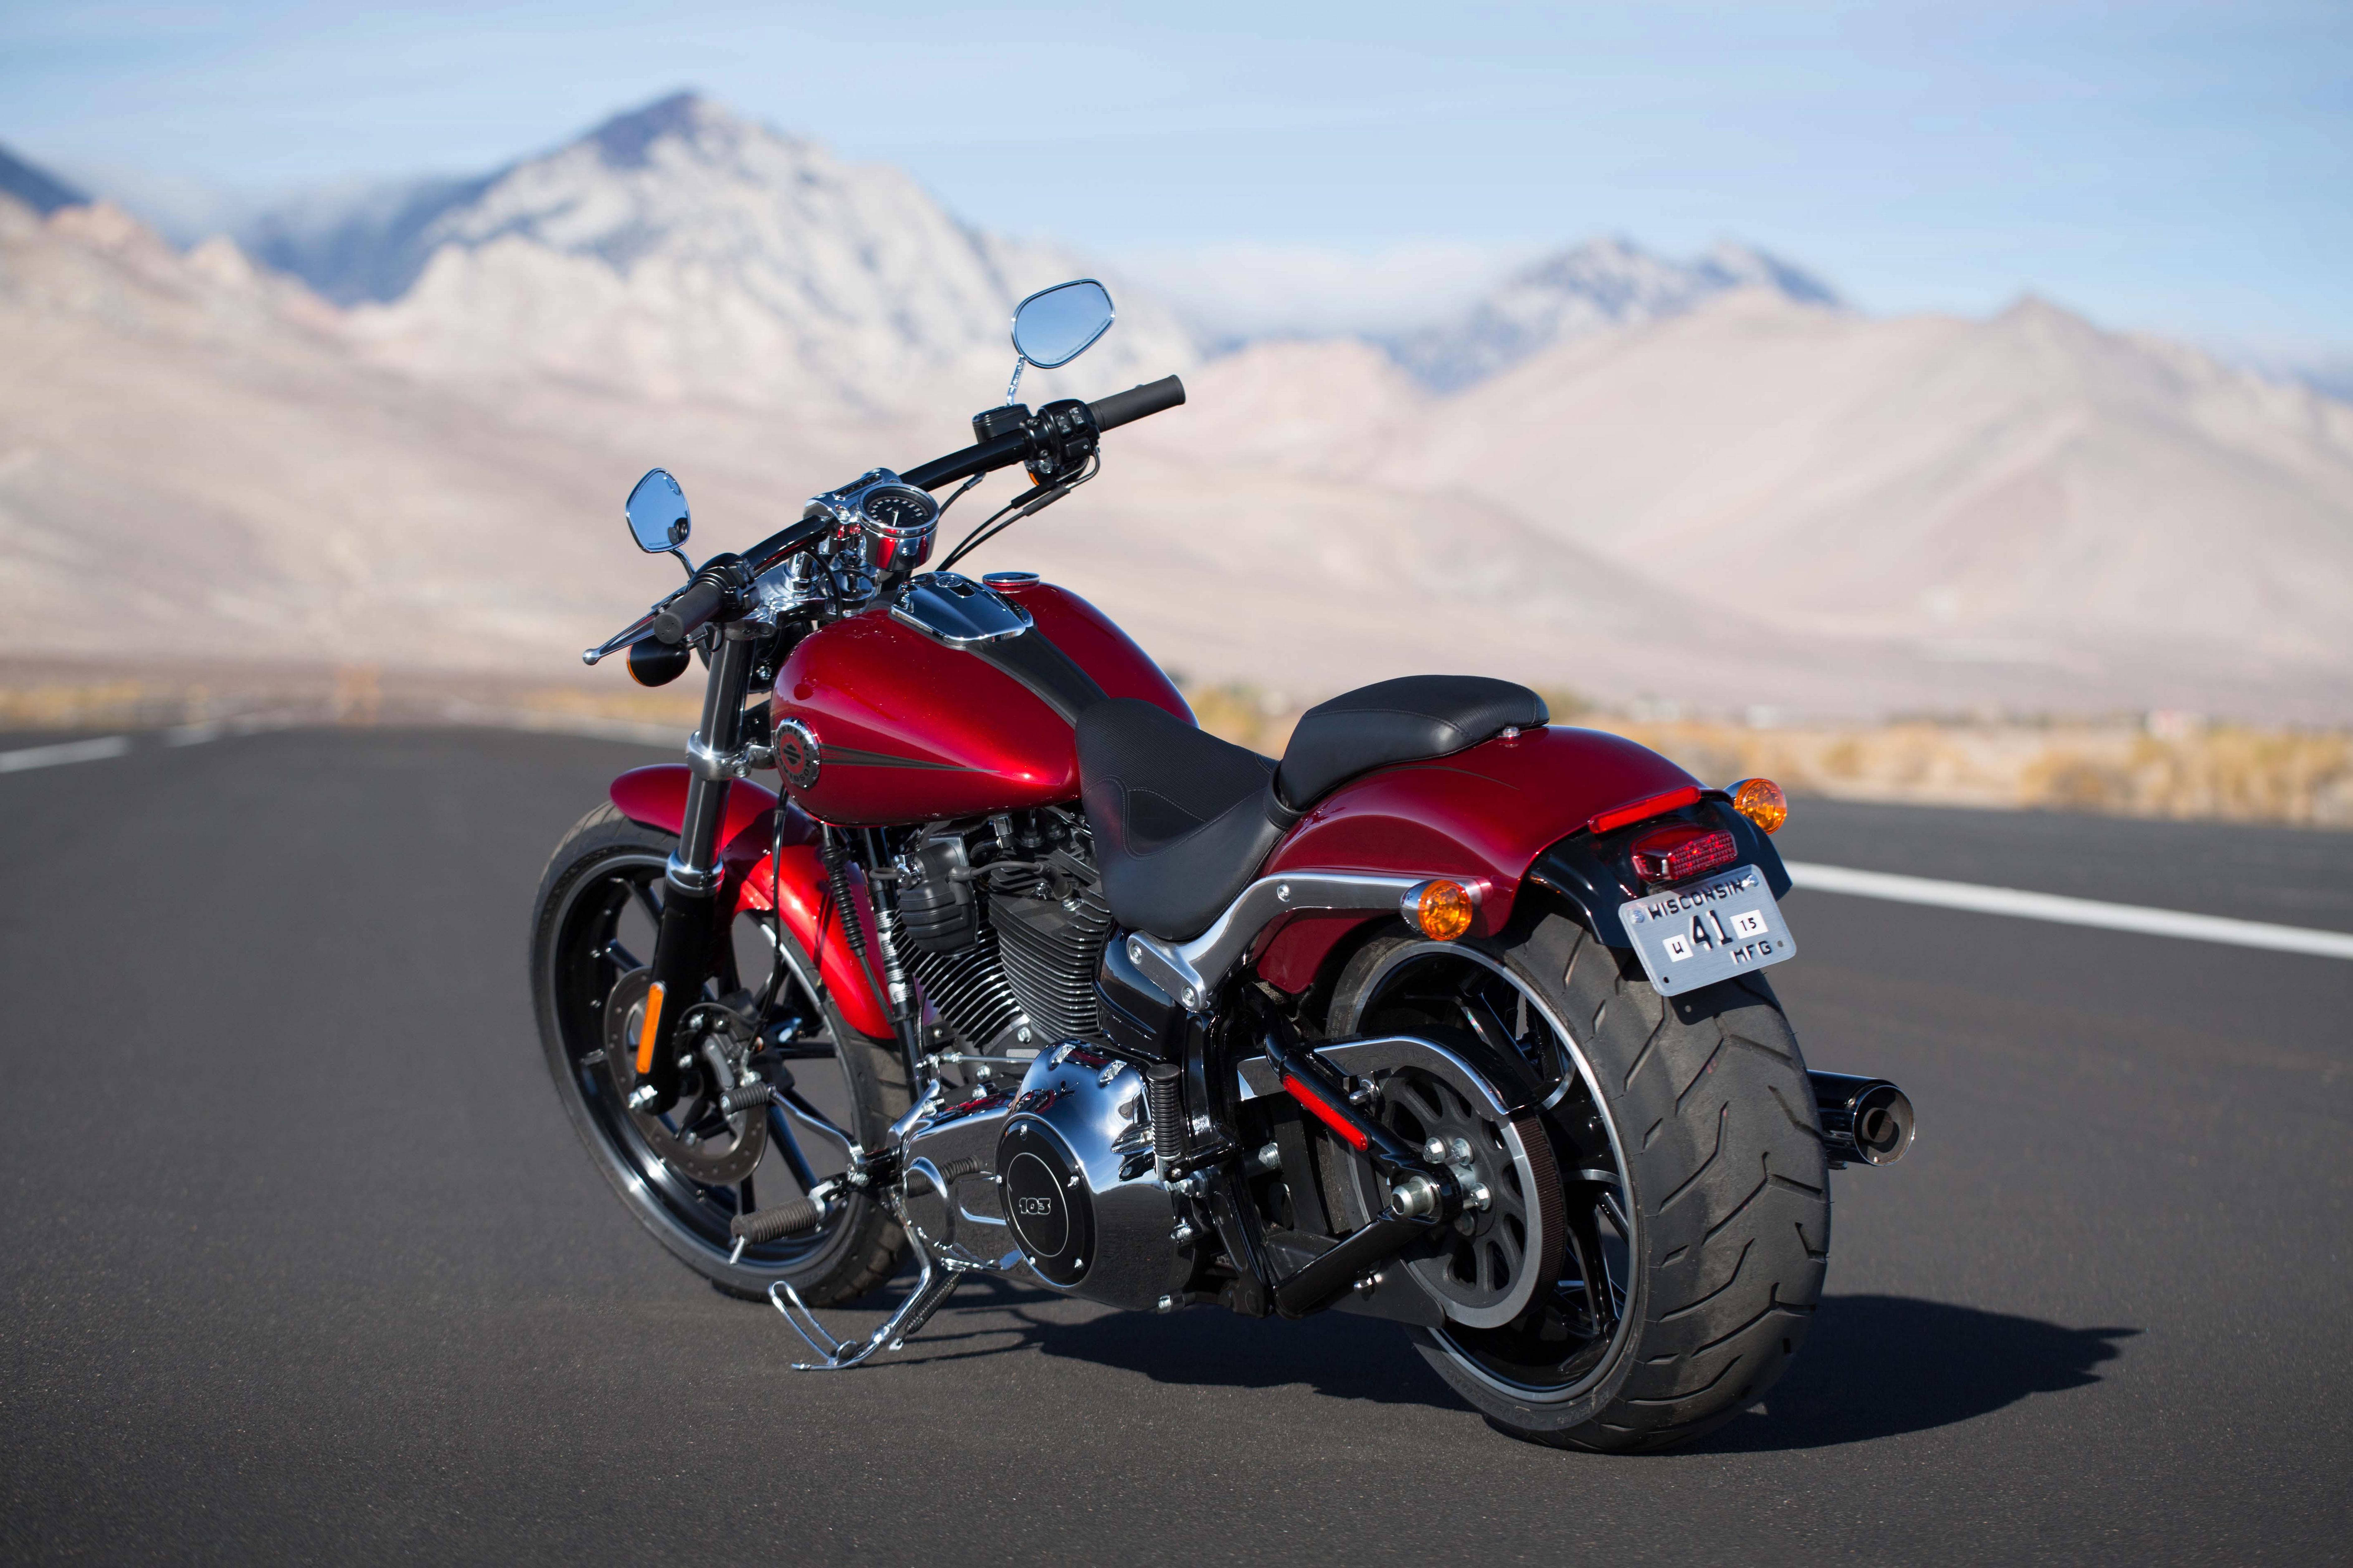 Harley Breakout Cvo >> FOTO HD SOFTAIL BREAKOUT 2013 EXTERIOR 8